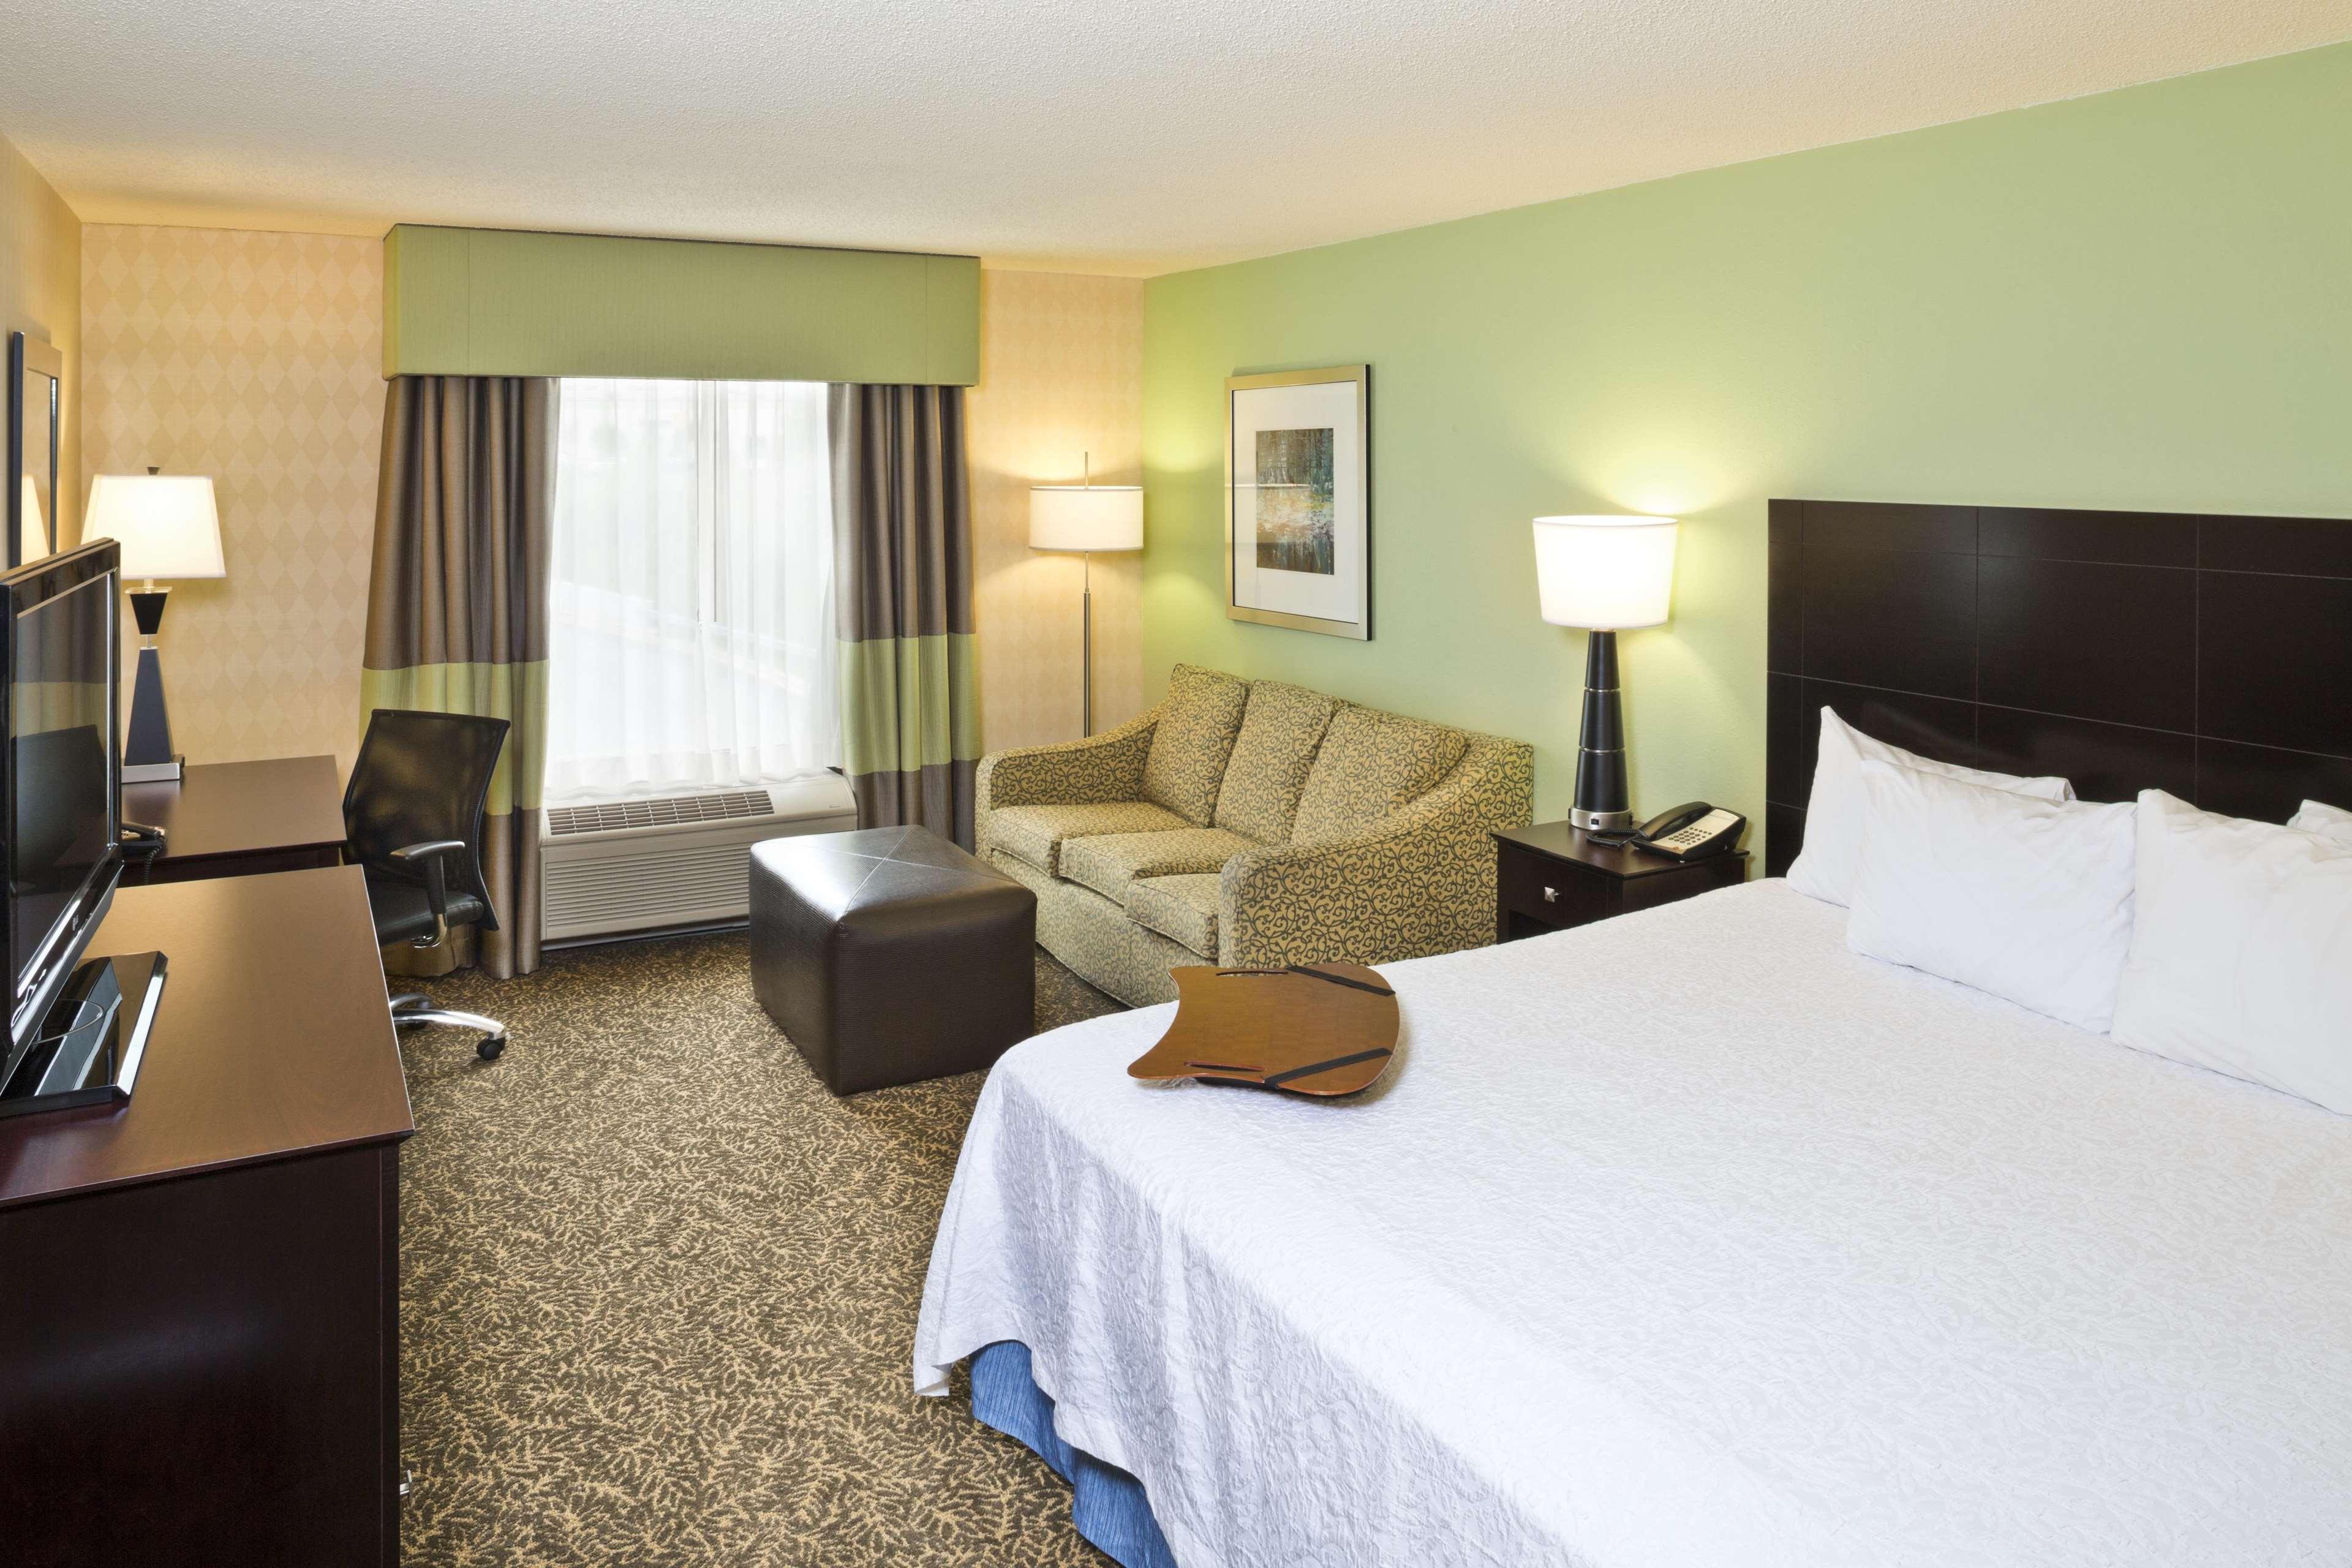 Hampton Inn & Suites Arundel Mills/Baltimore image 18